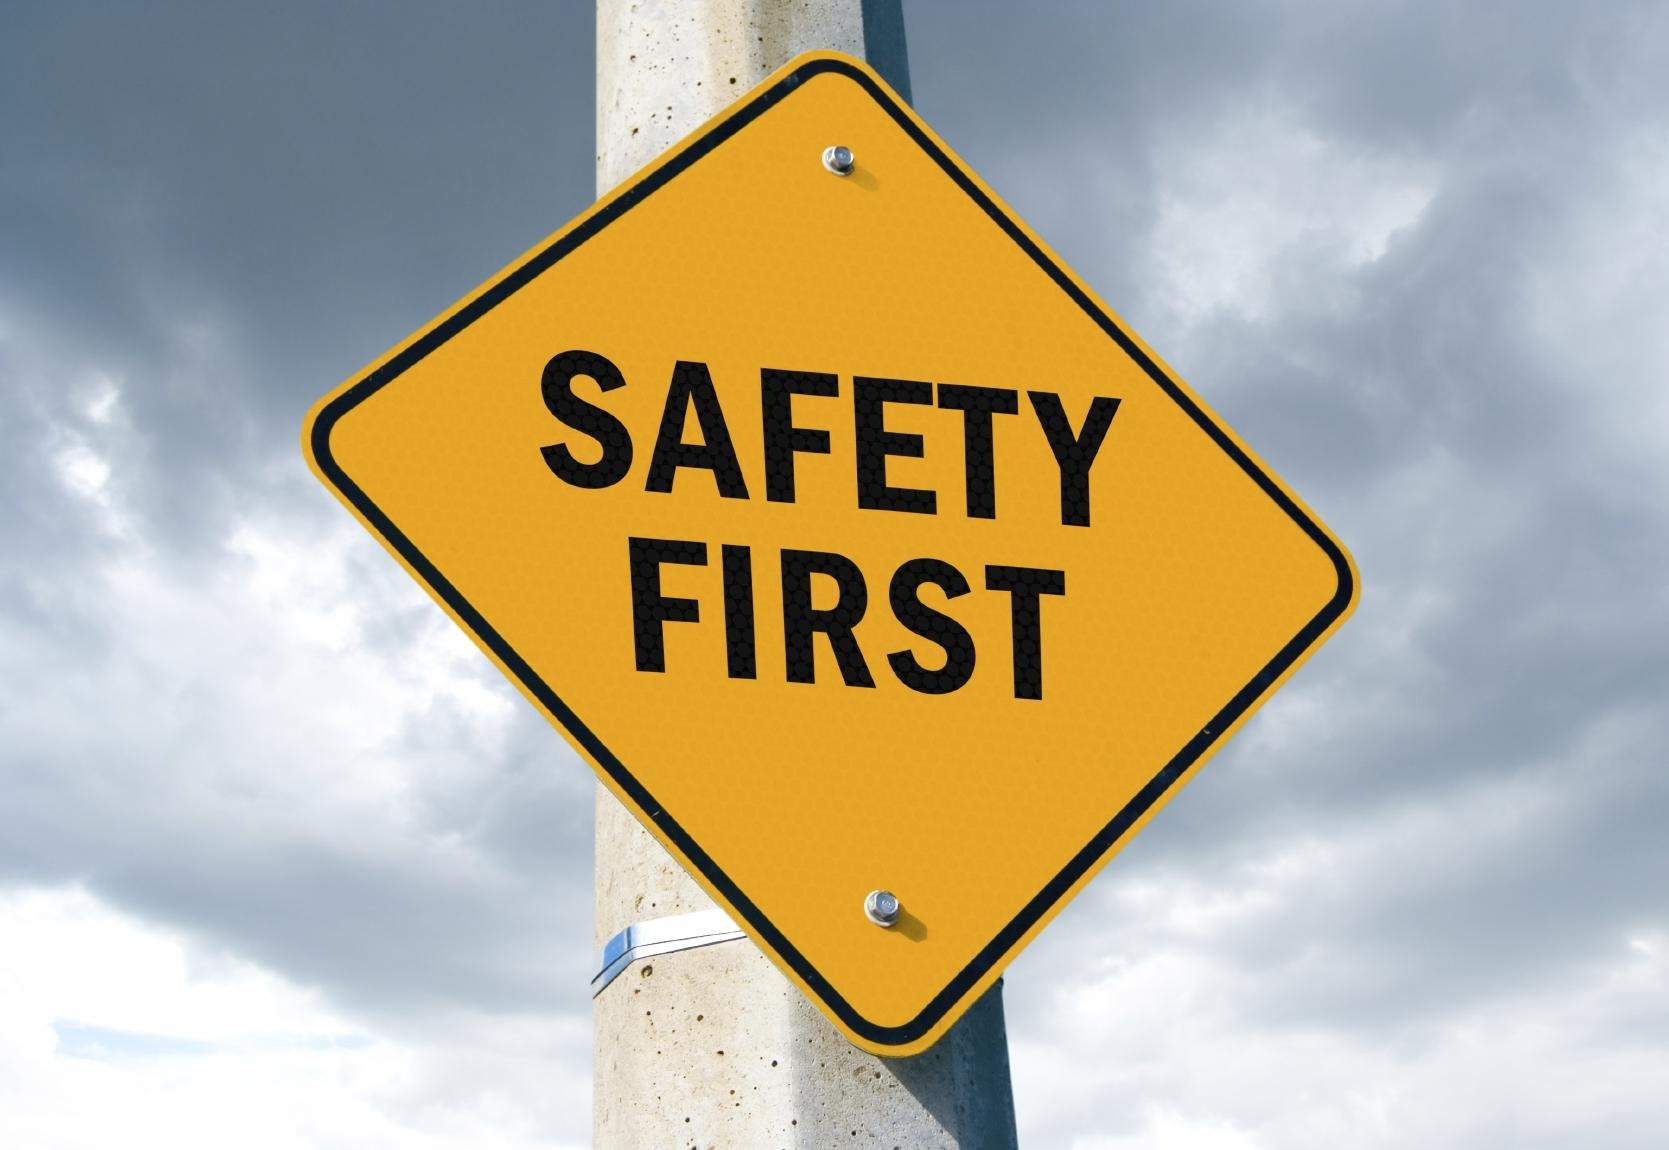 dfed49bde8e20ac12959_Safety.jpg